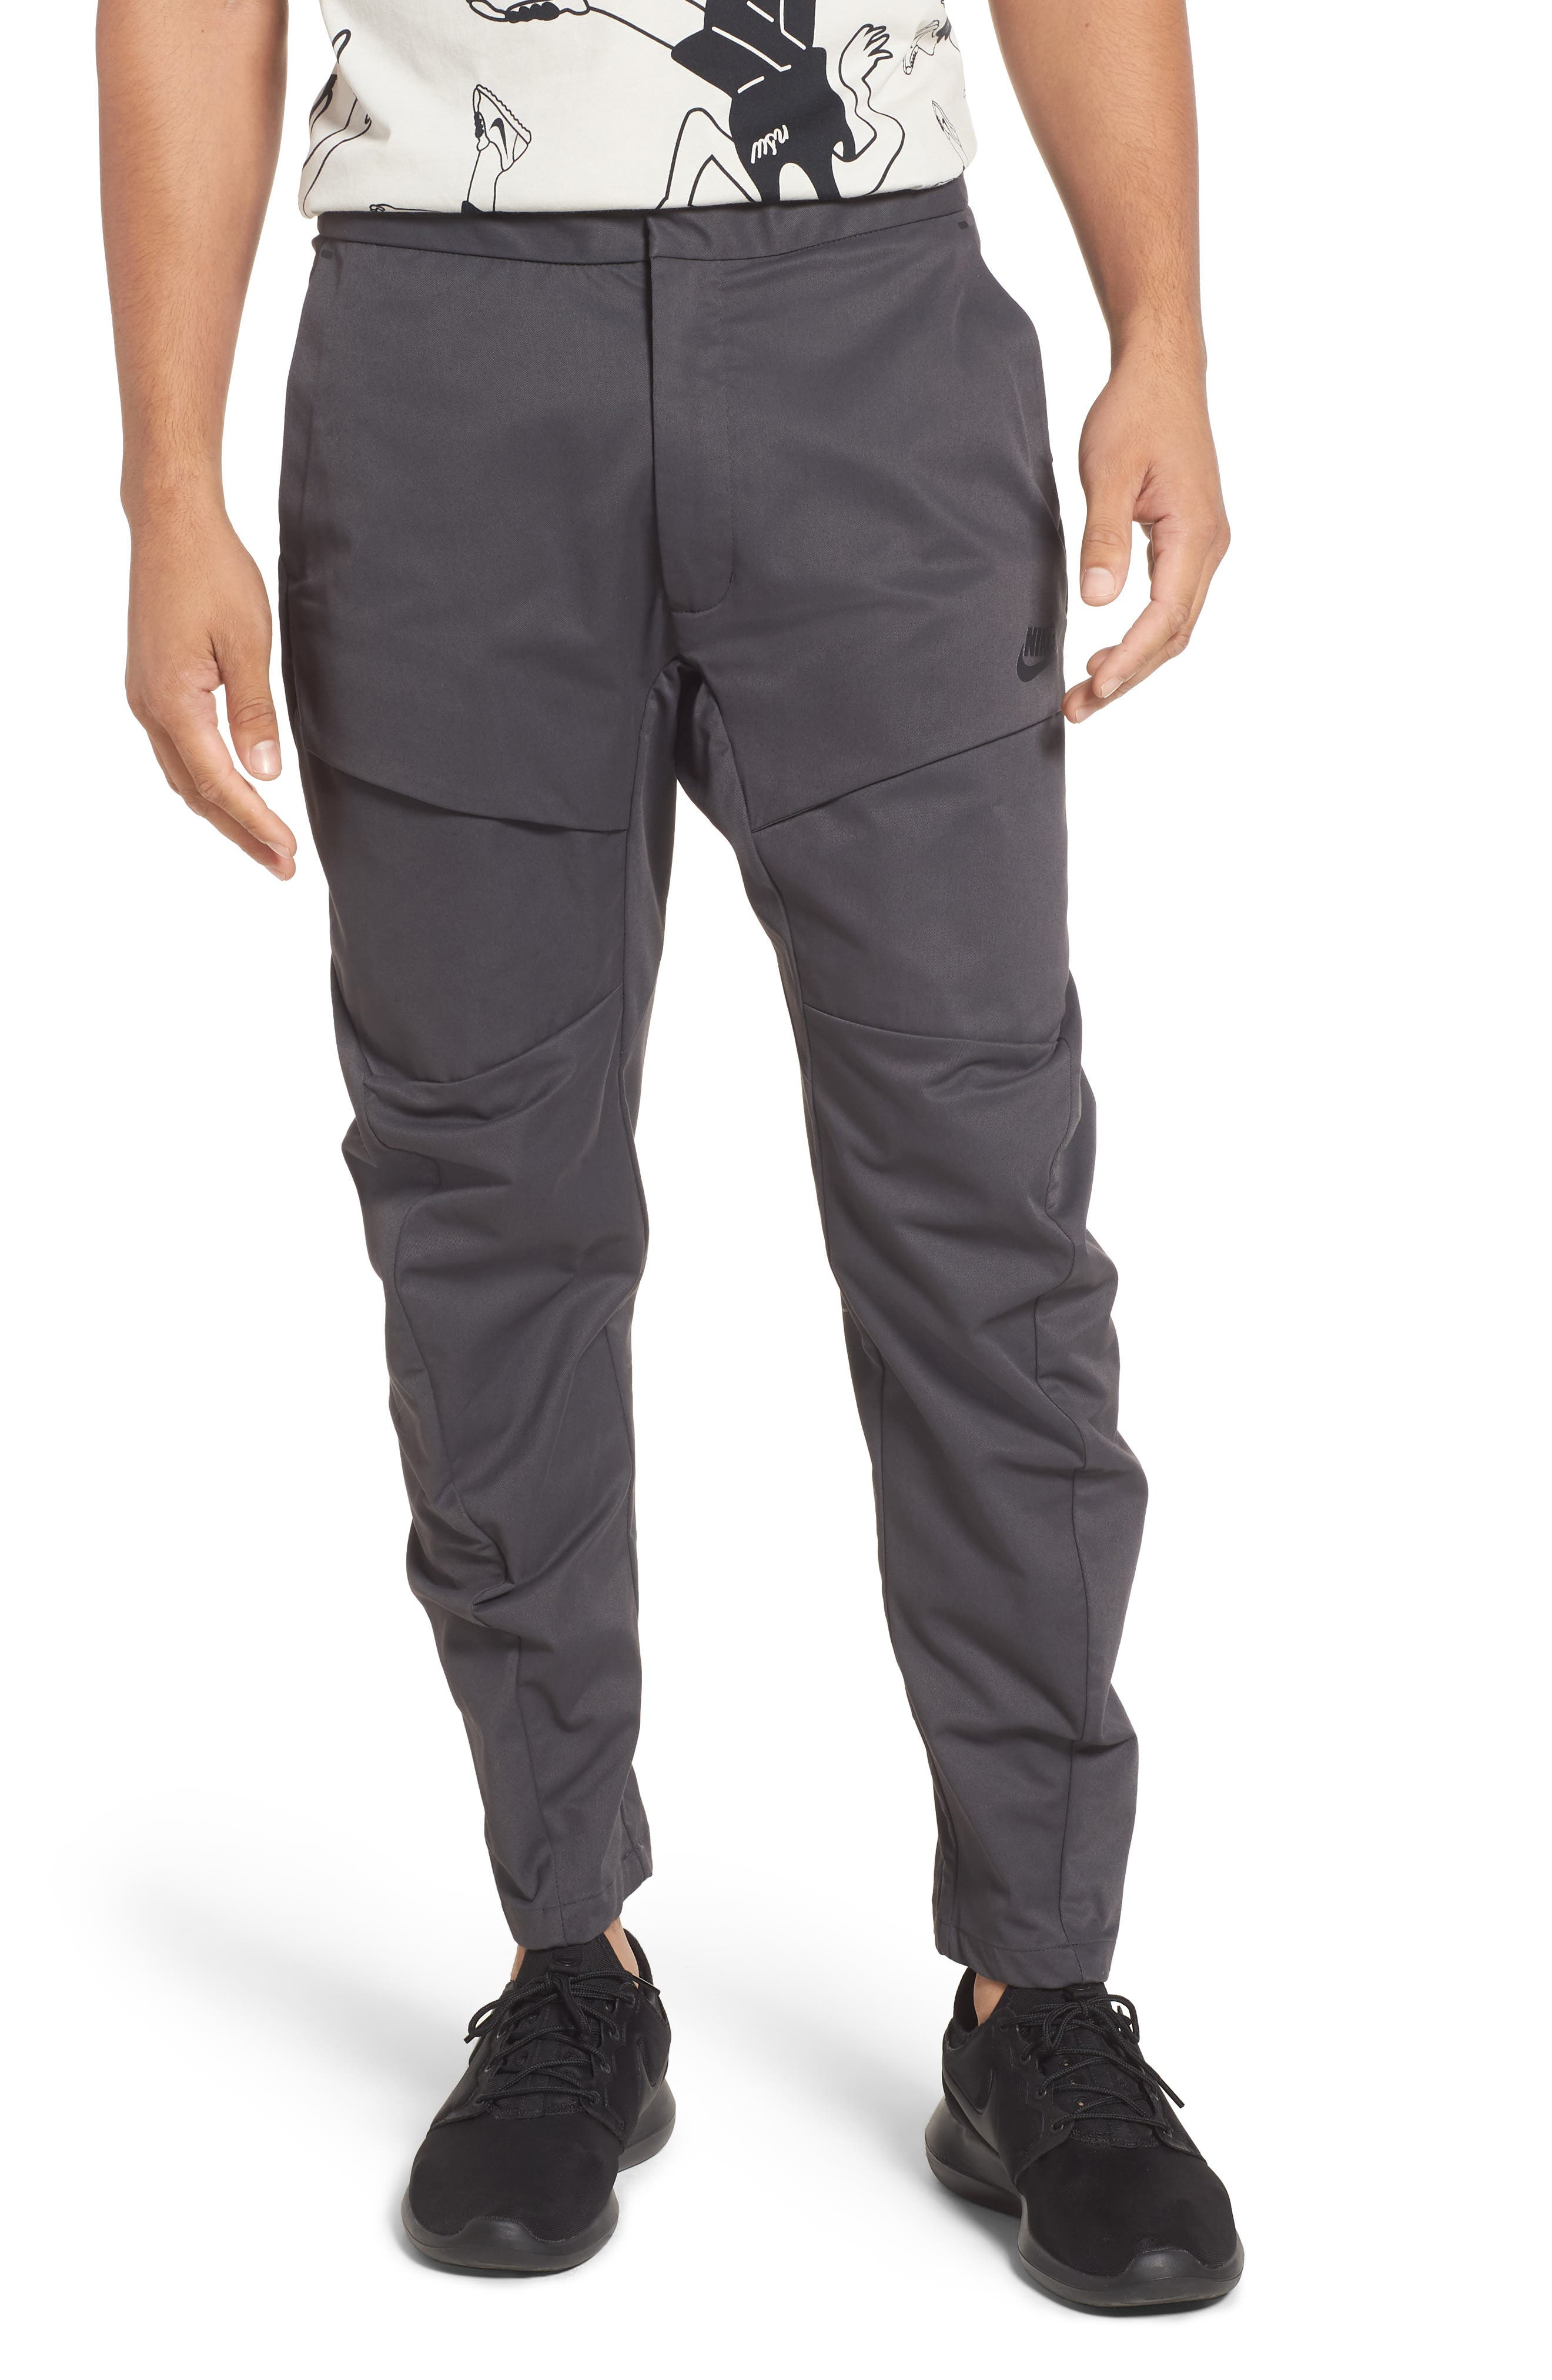 Nike Tech Pack Cargo Pants Grey